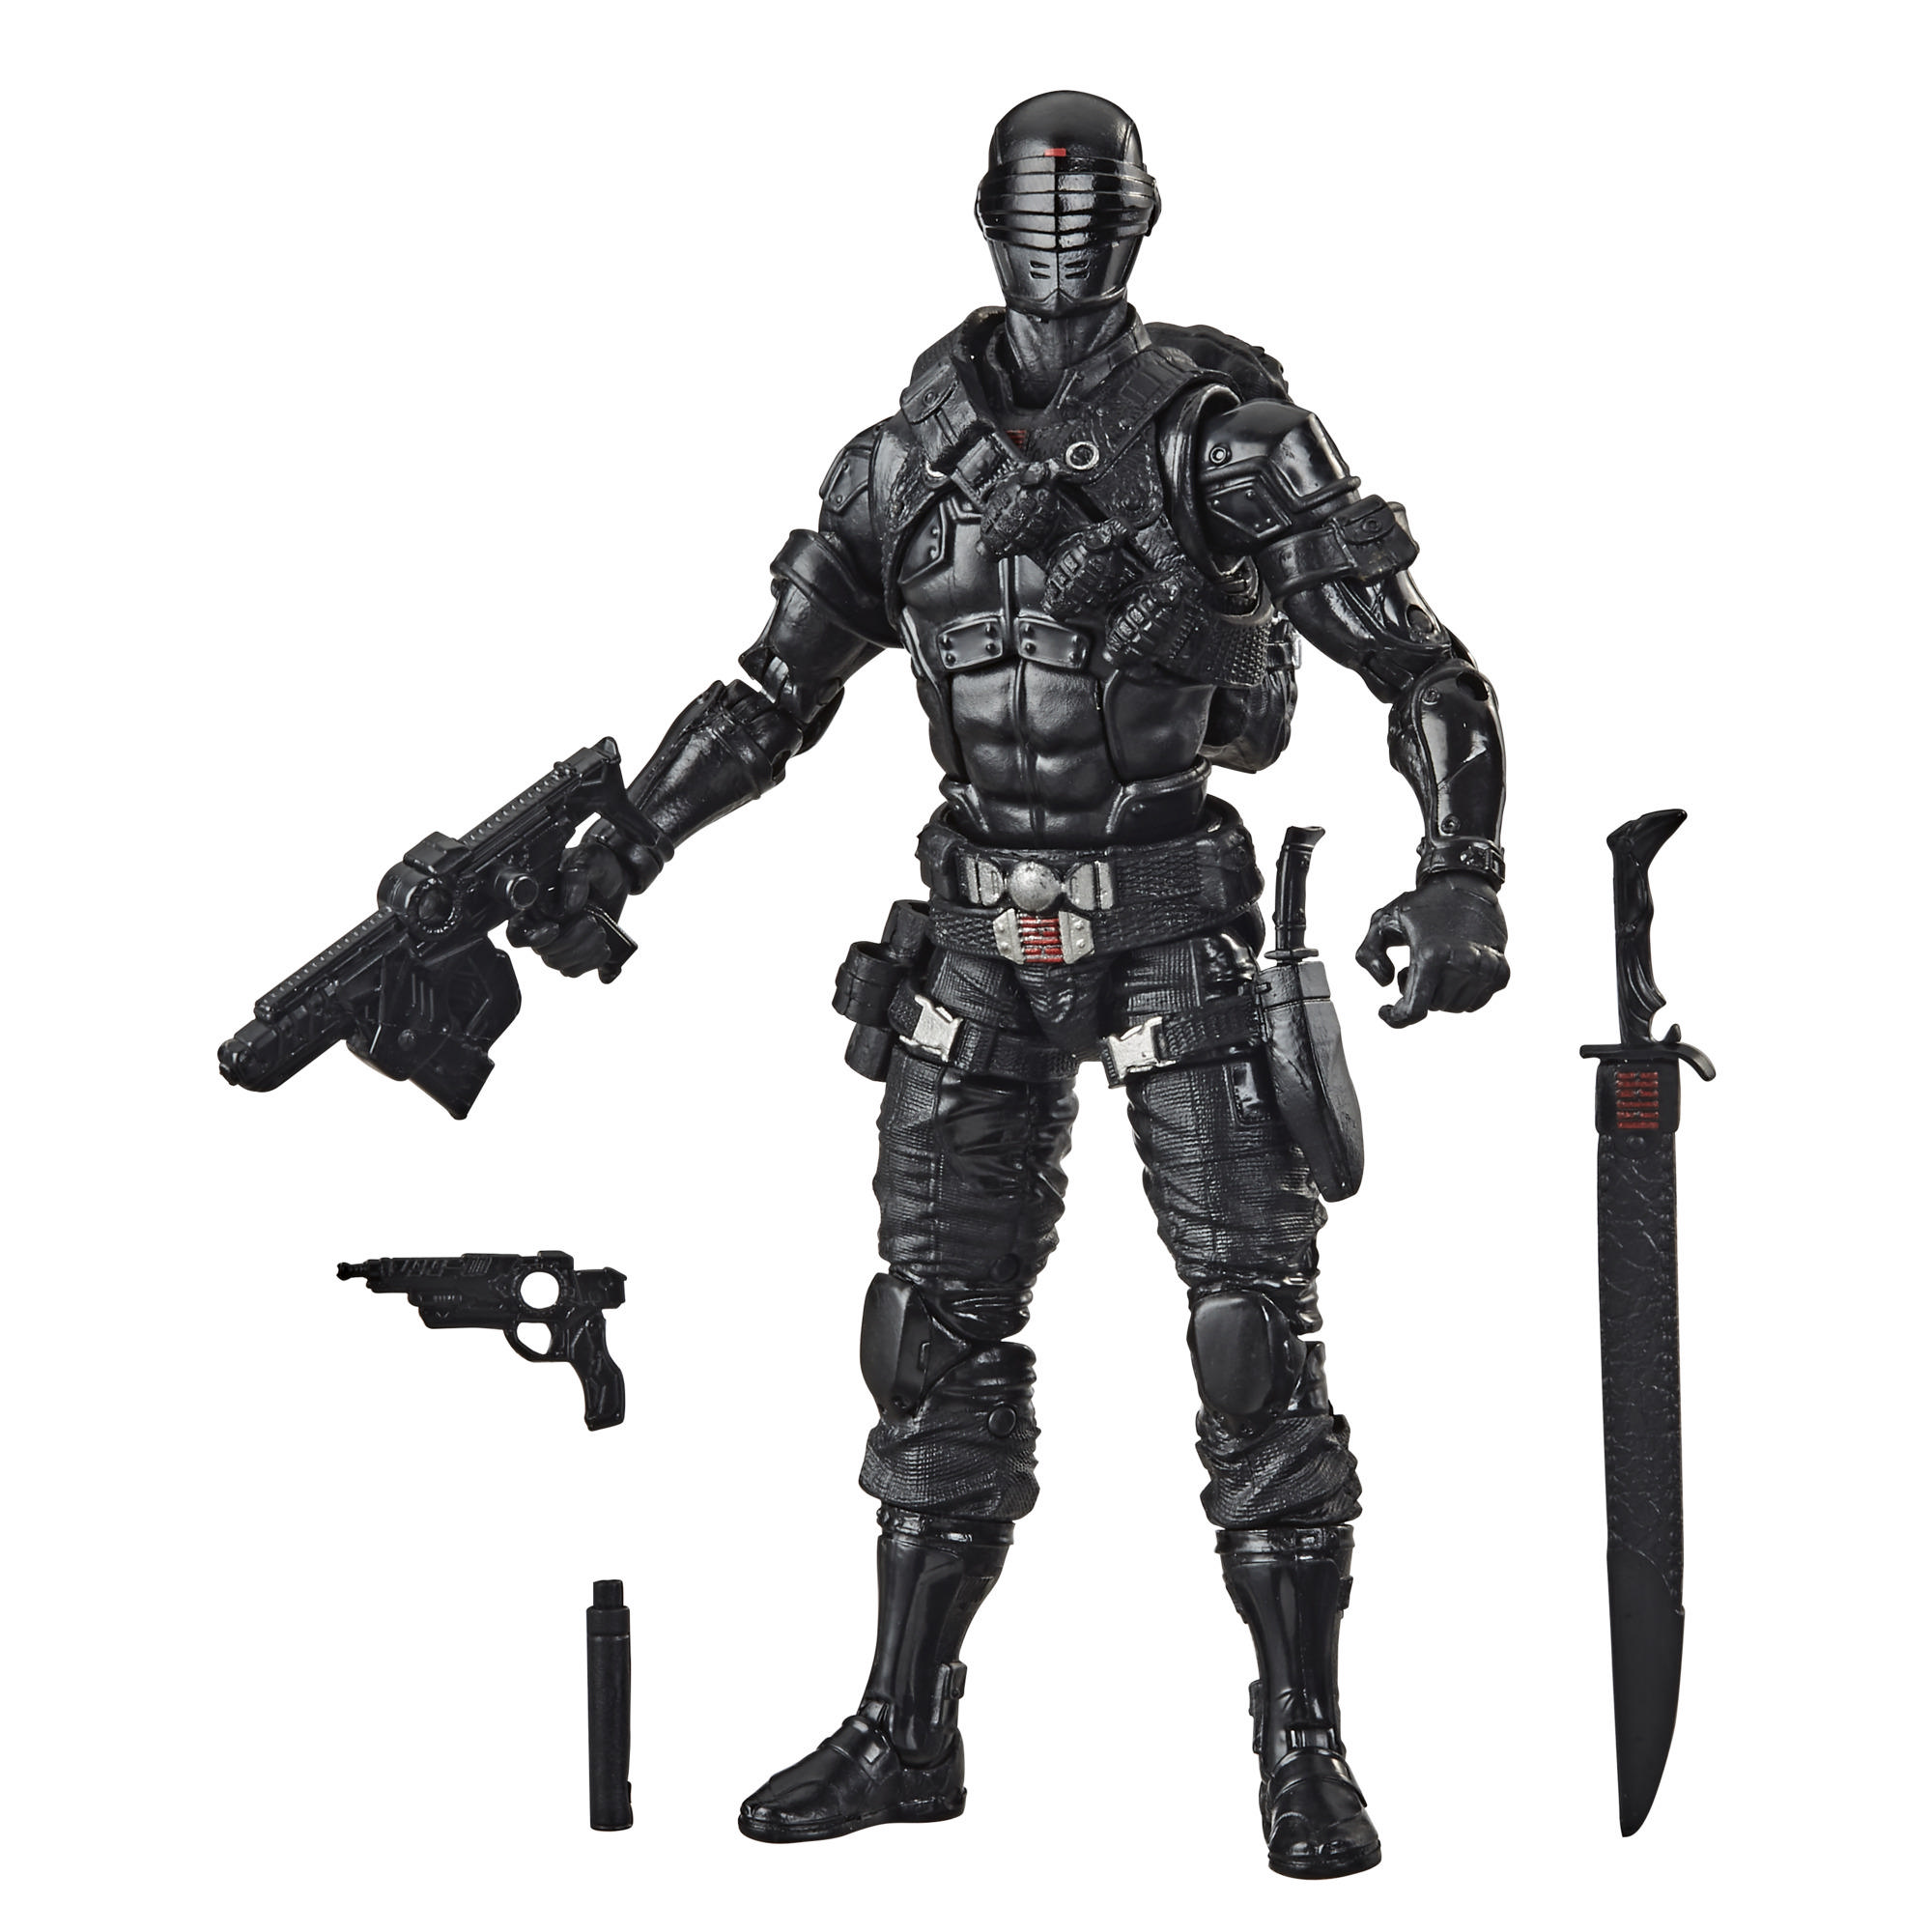 G.I. Joe Classified Series - Figura Snake Eyes 02 con múltiples accesorios